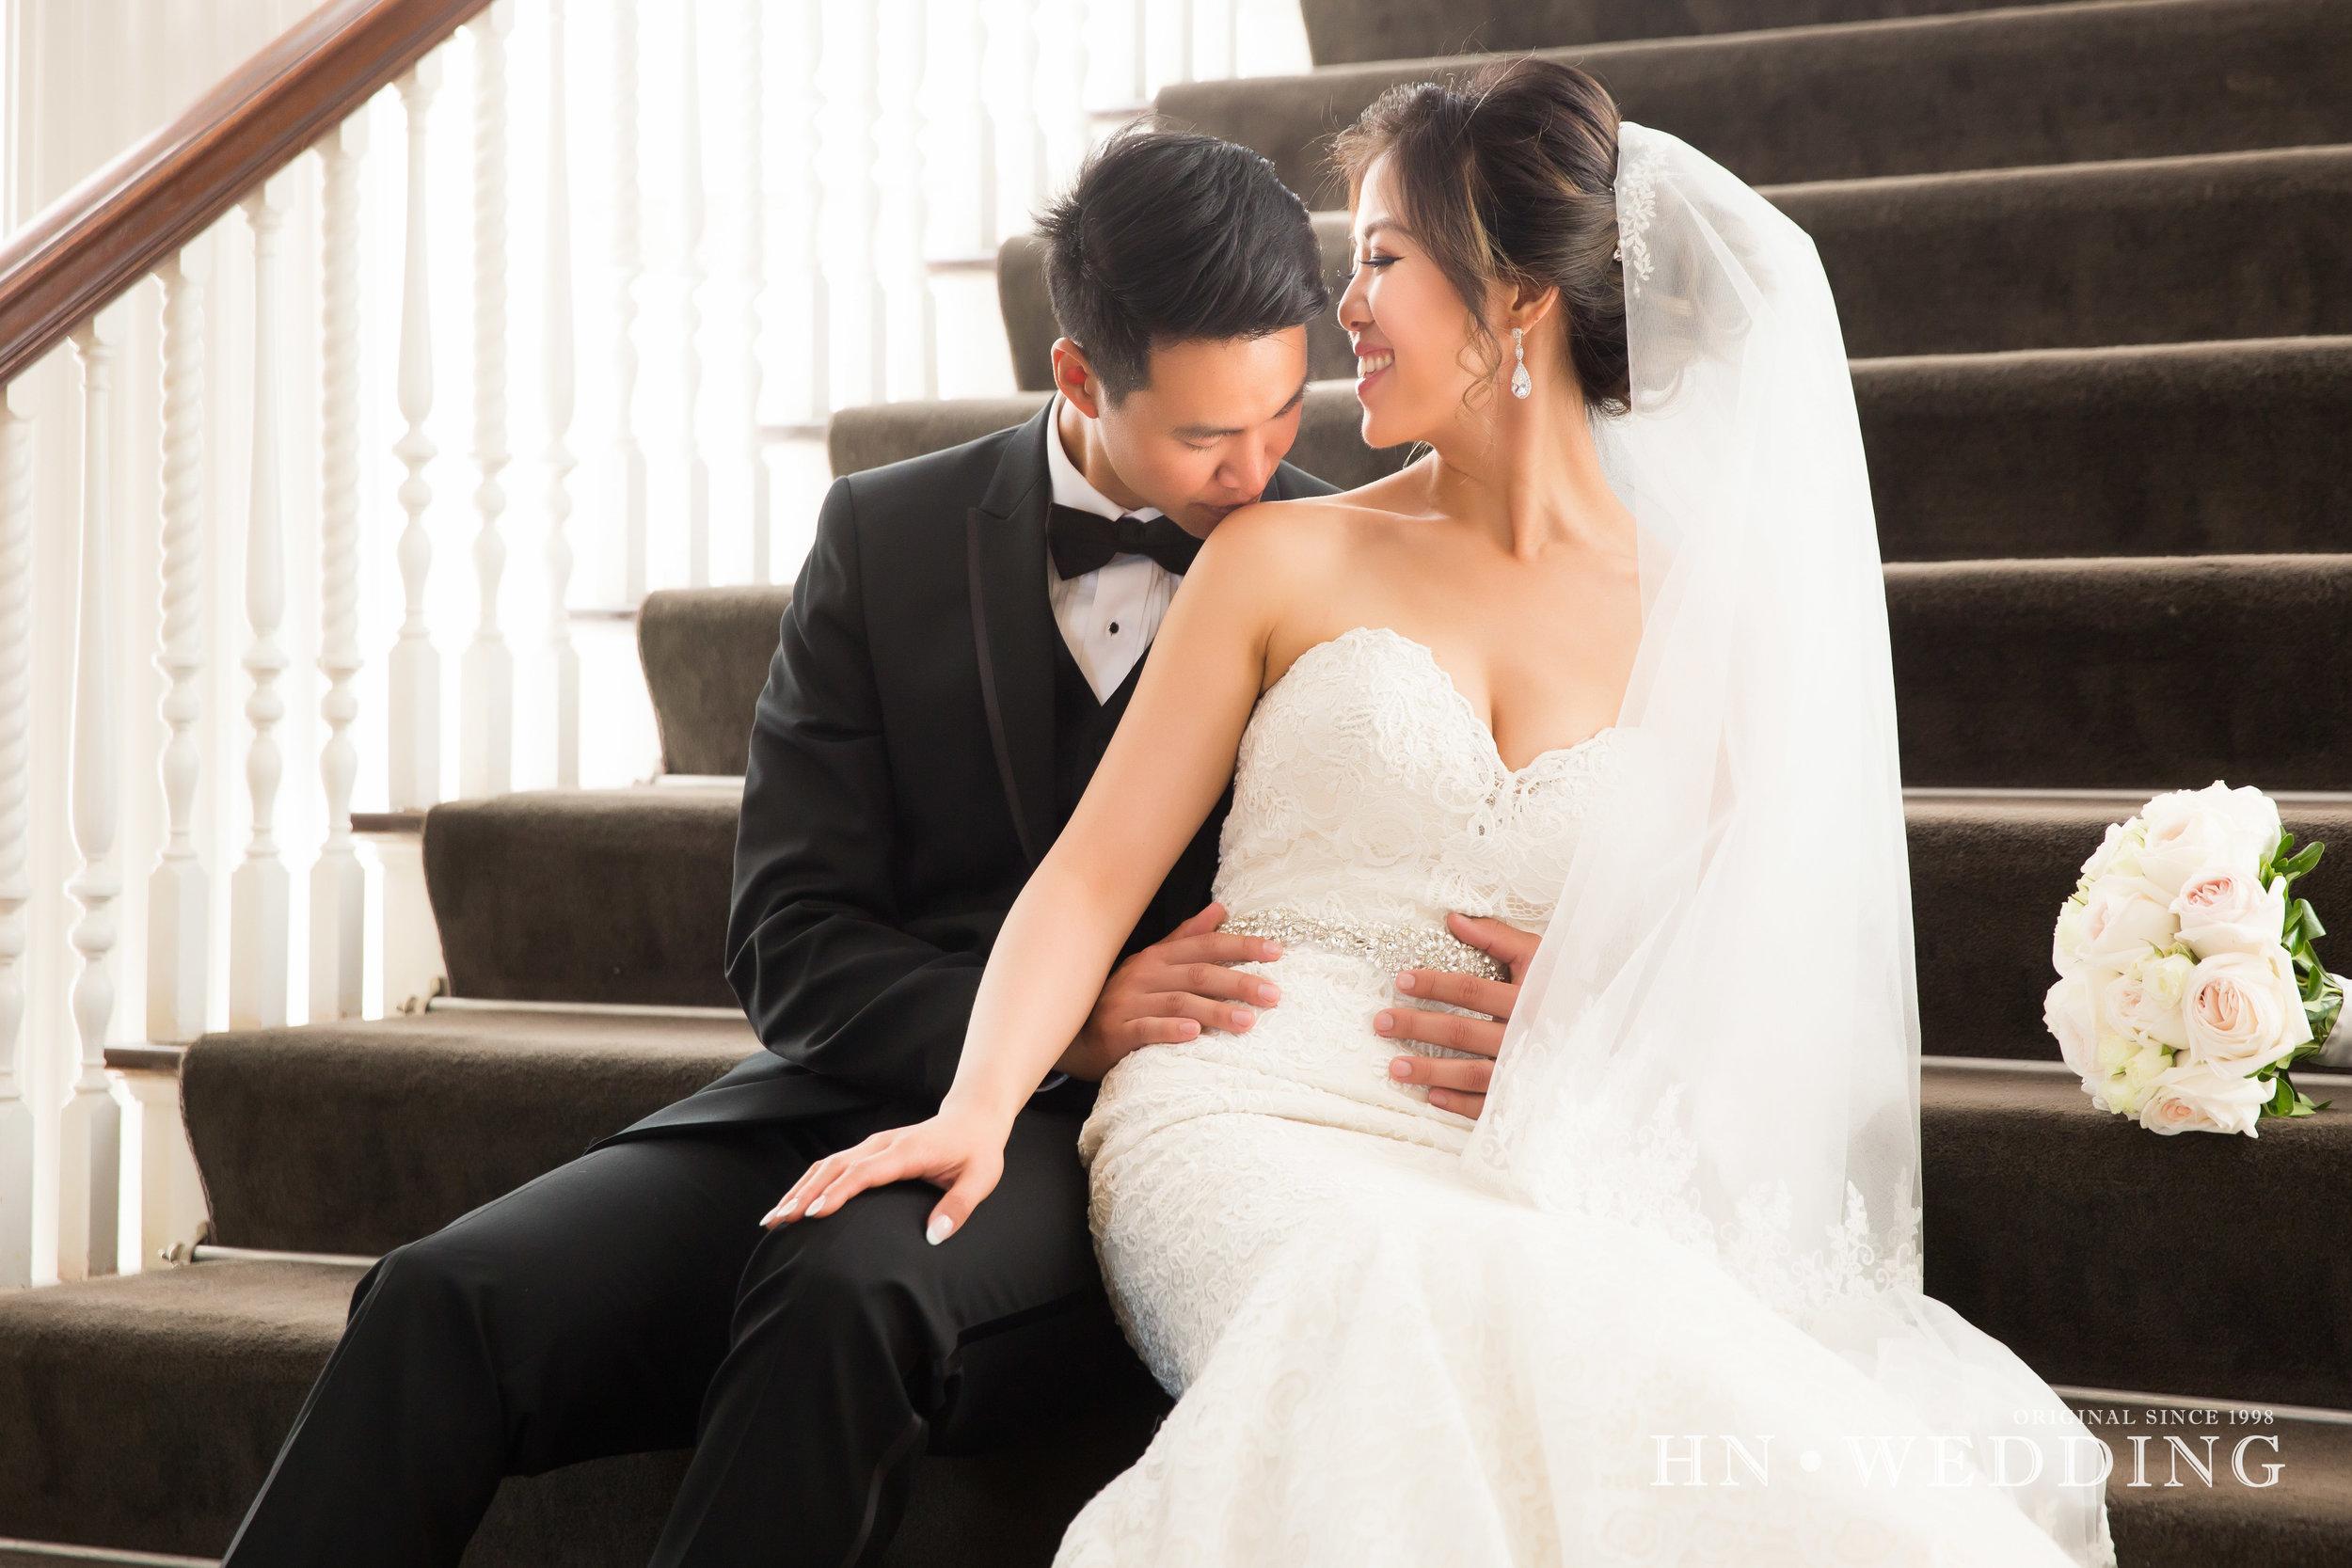 HNwedding-weddingday-20170729--49.jpg